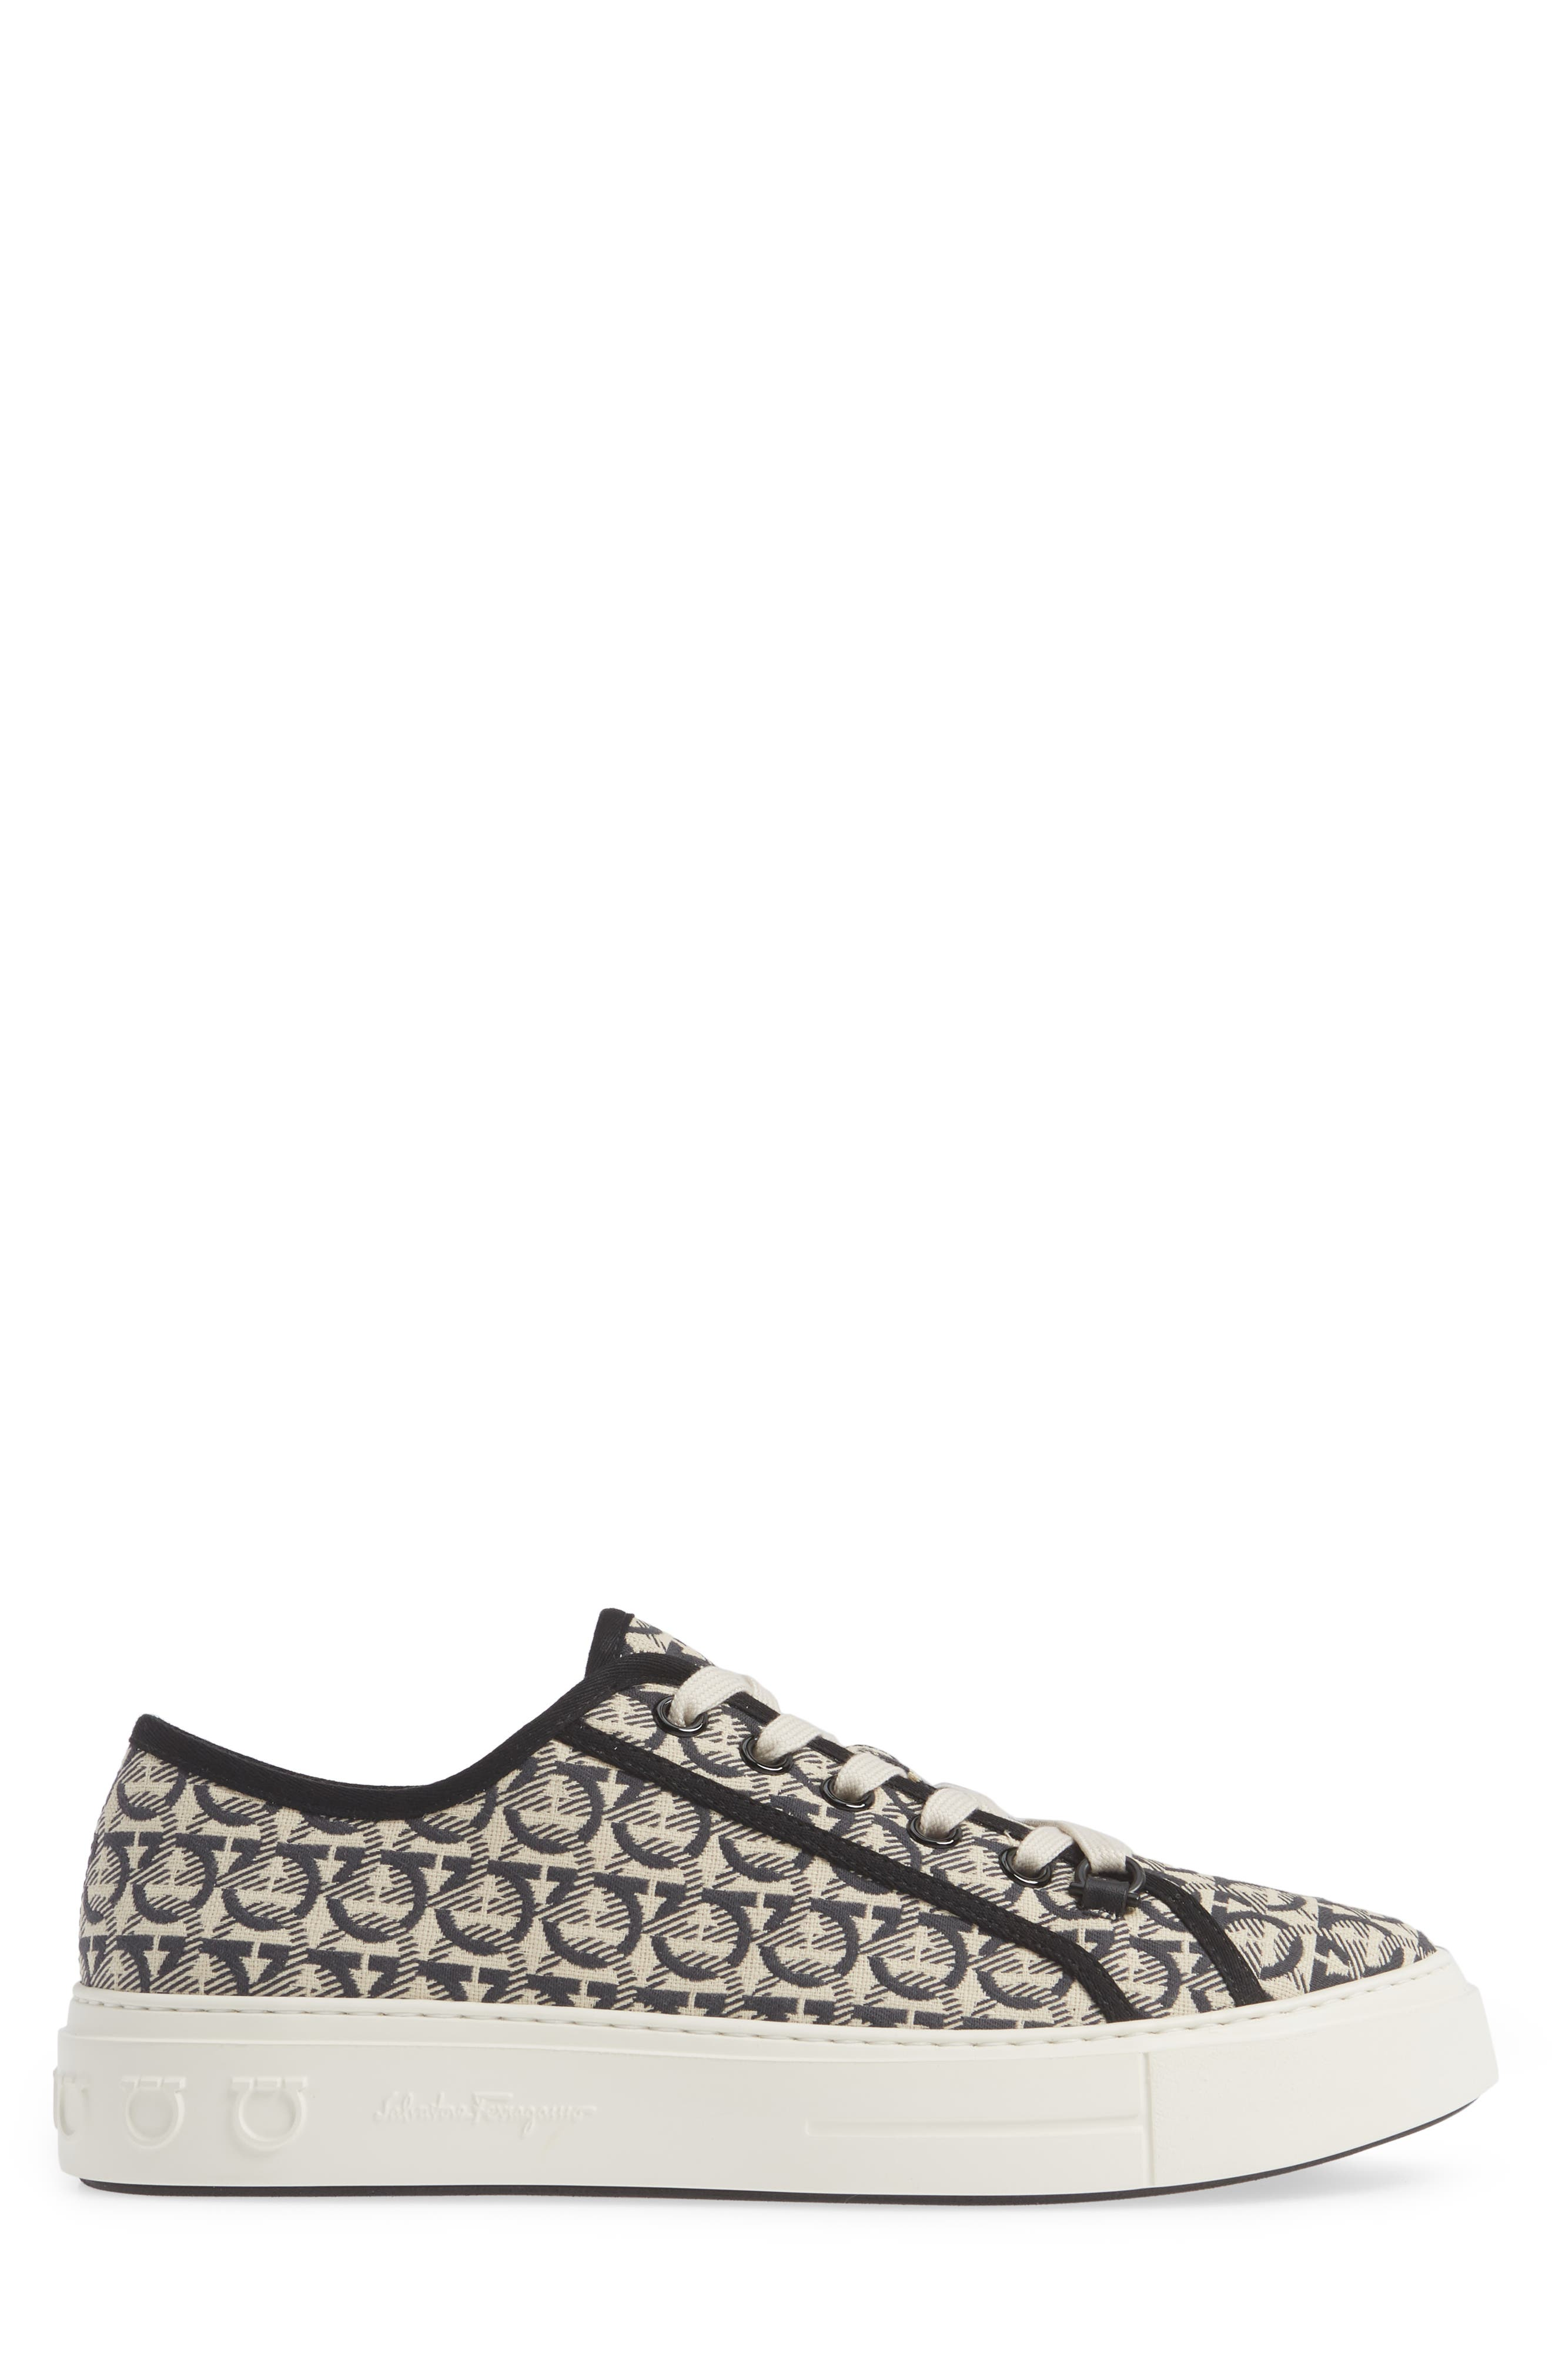 Anson Sneaker,                             Alternate thumbnail 3, color,                             BEIGE/NERO